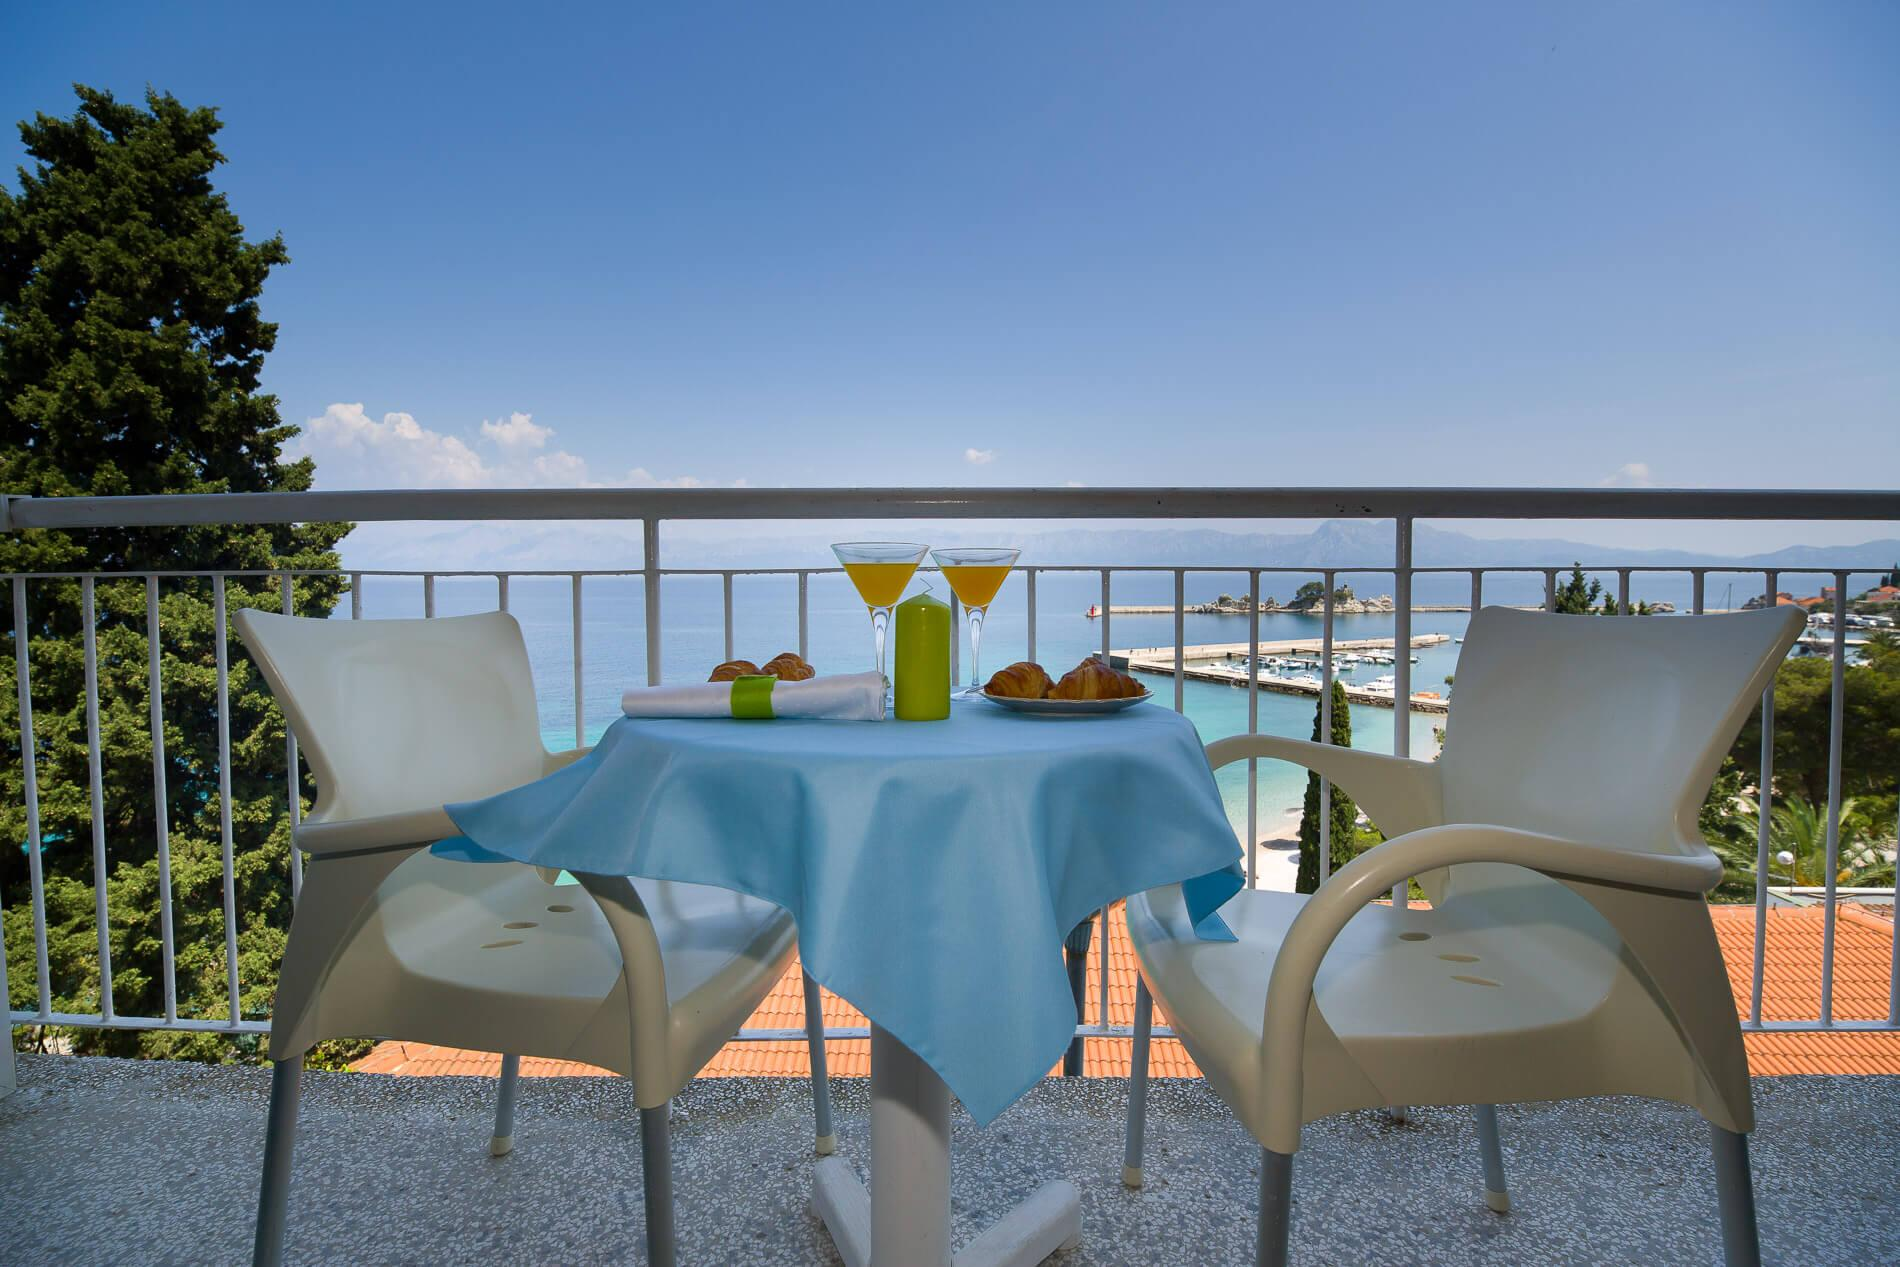 21_Comfort and Family sea side balcony